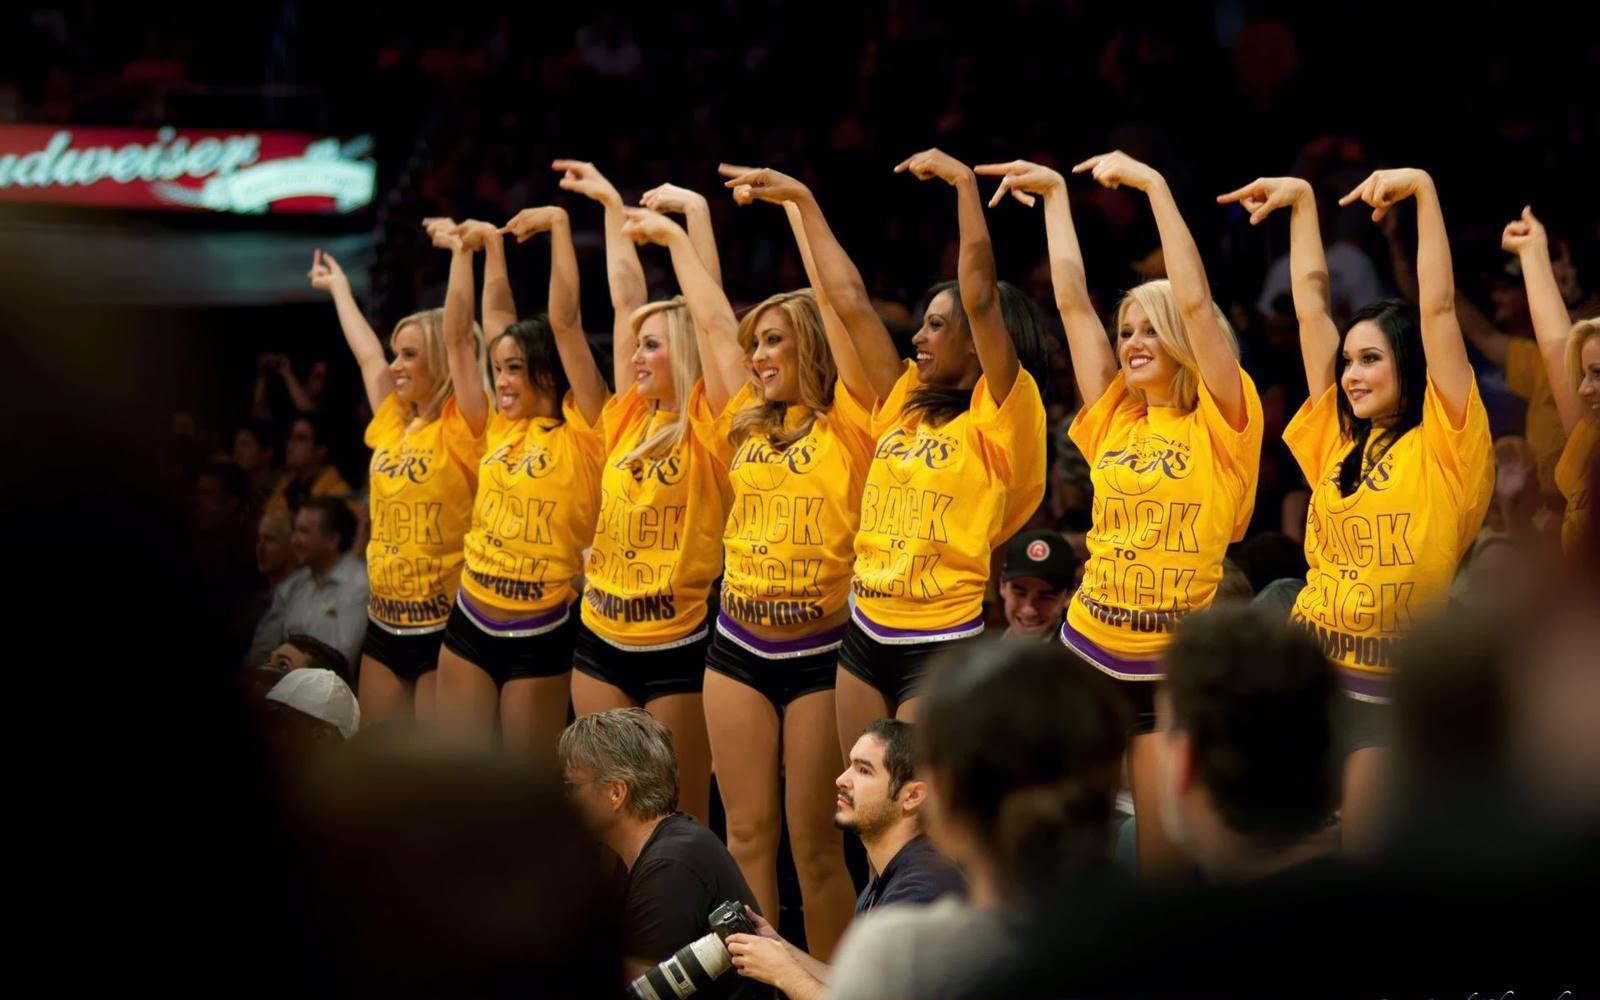 Rewallpaper Los Angeles Lakers 2014 Cute Cheerleaders Nba Usa Hd Desktop Wallpaper